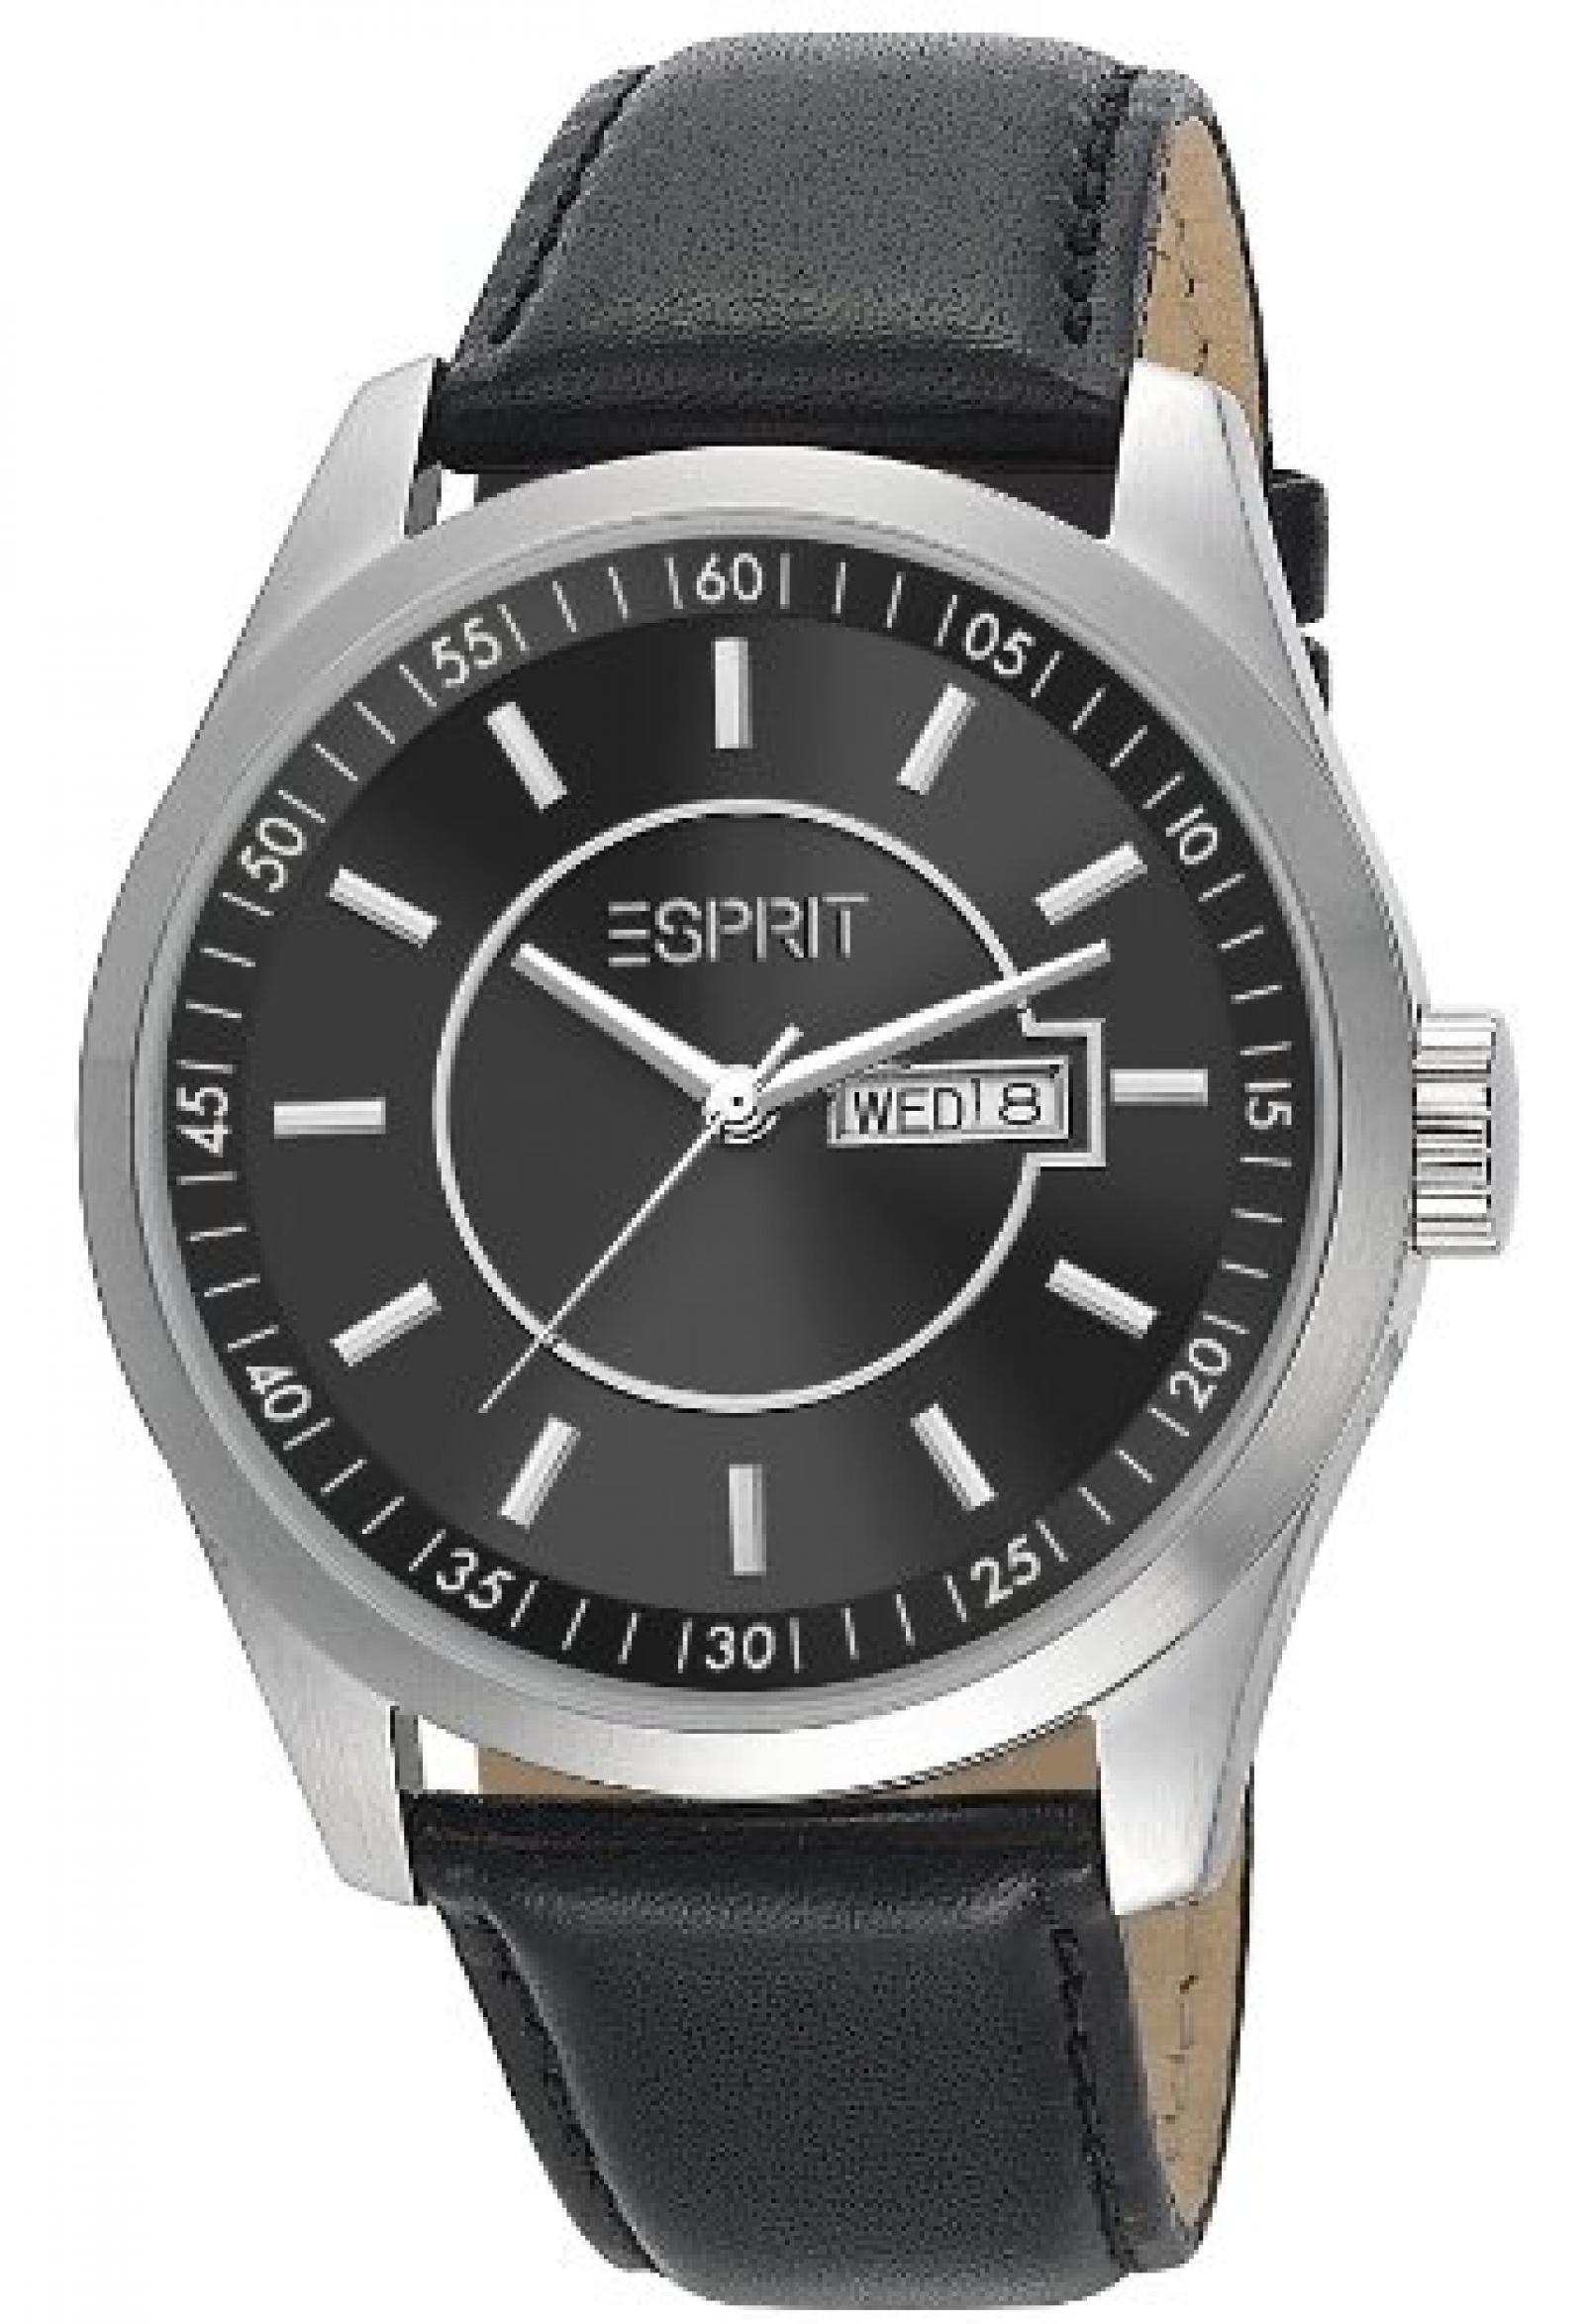 Esprit Herren-Armbanduhr XL Circolo Night Analog Quarz Leder ES104081001